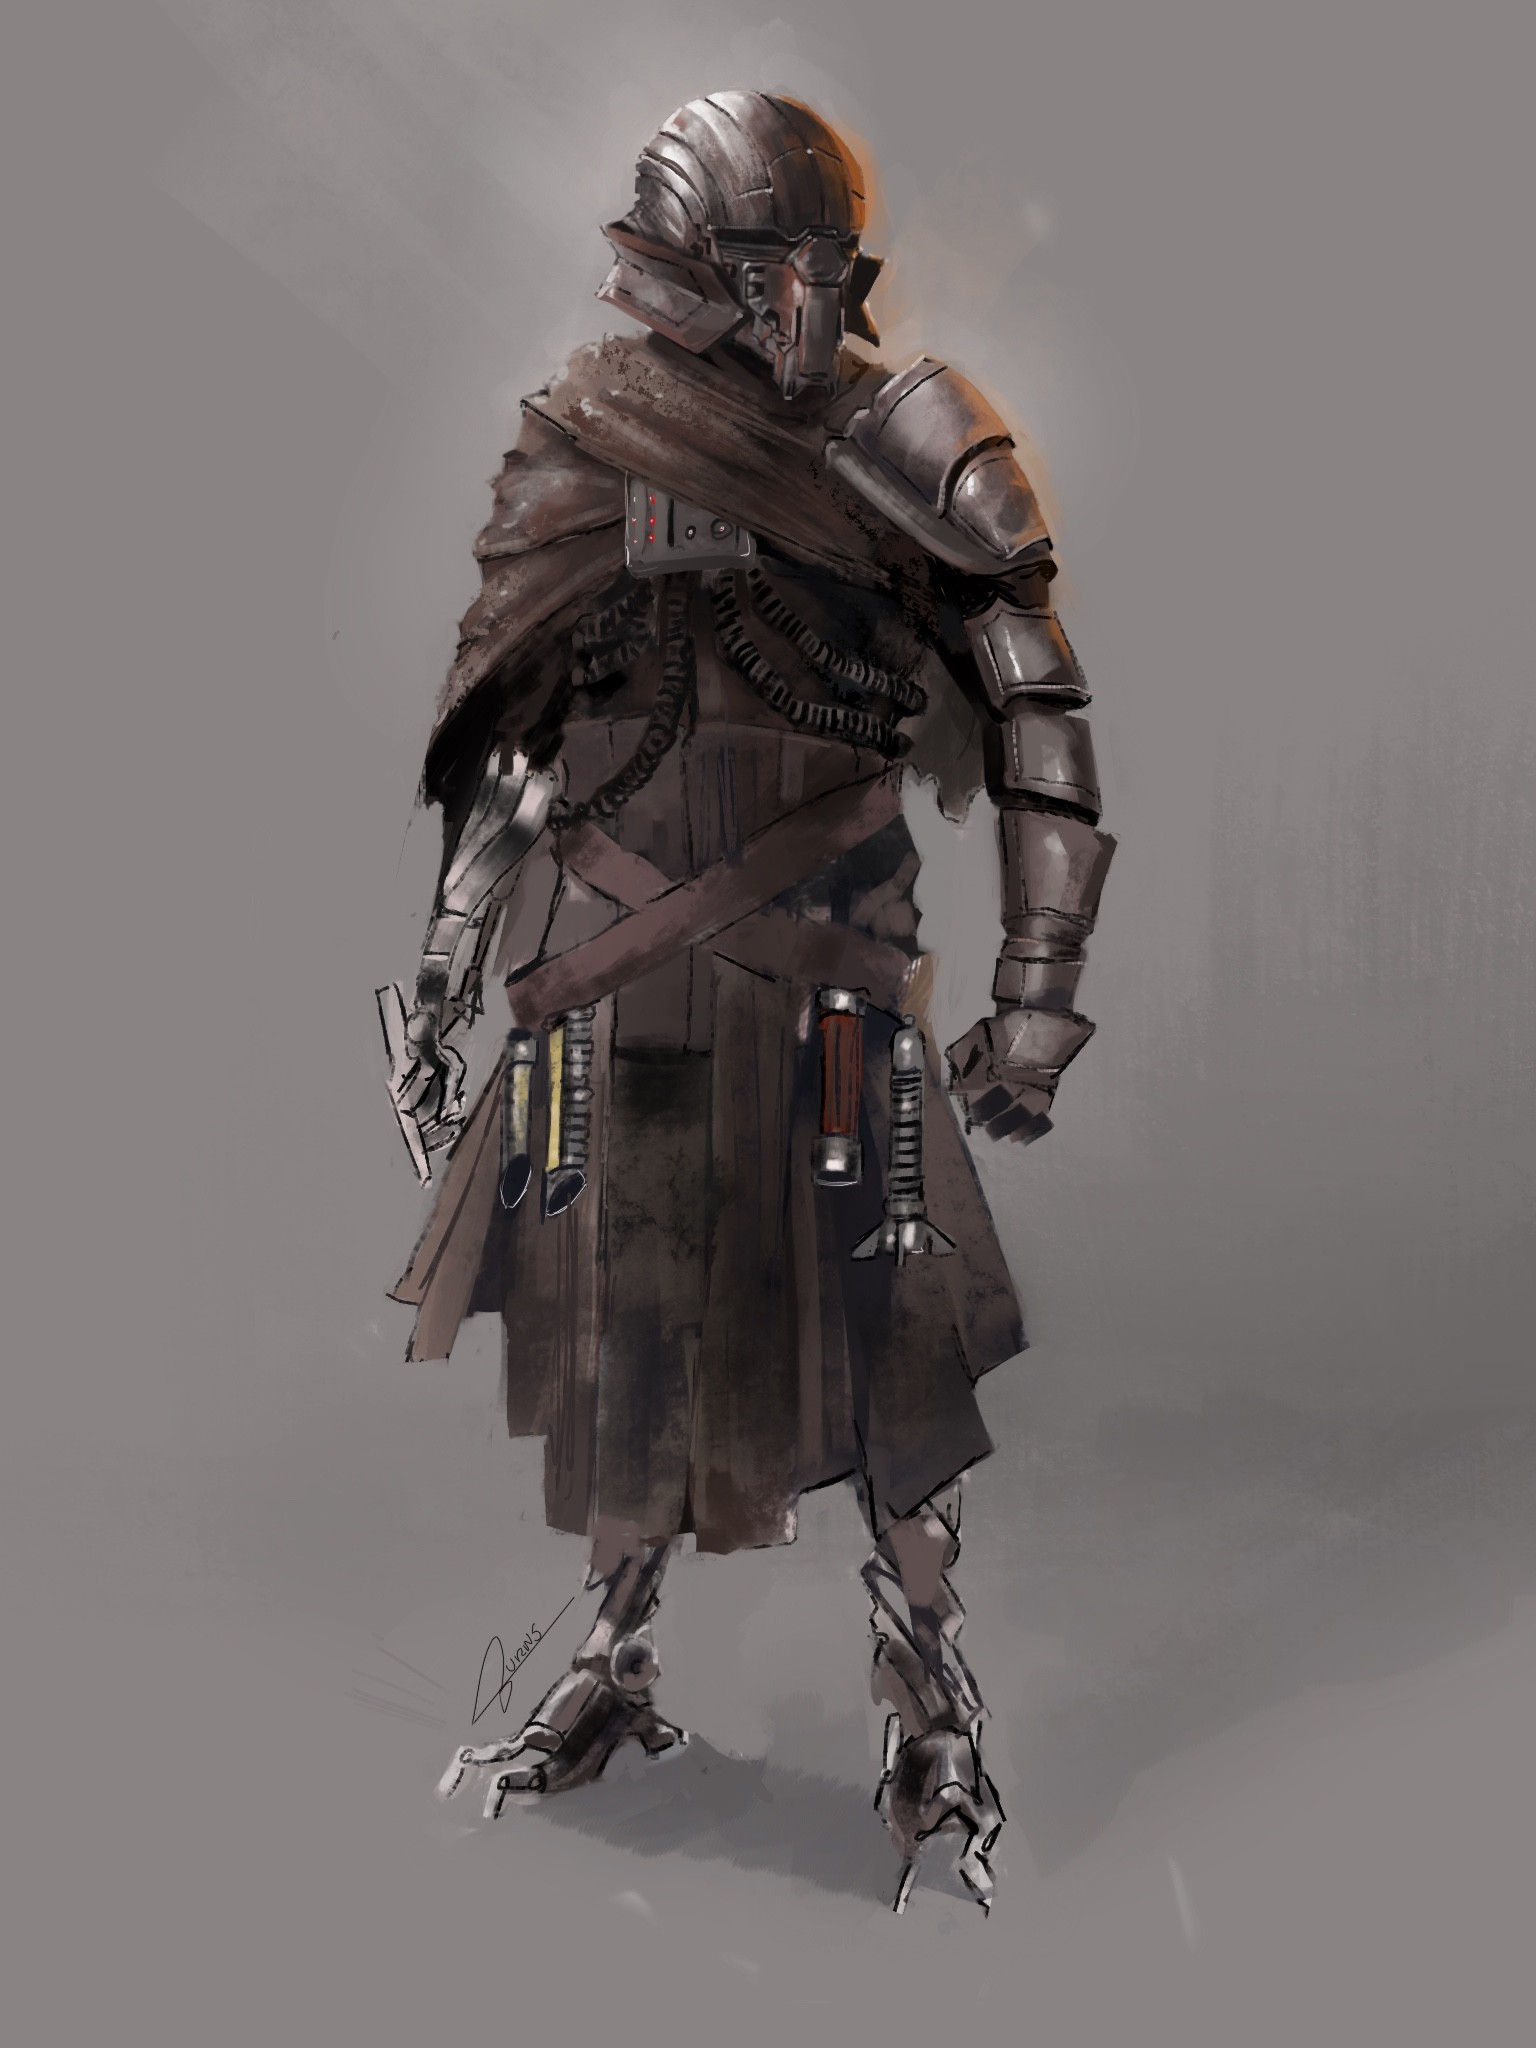 Sith cyborg concept